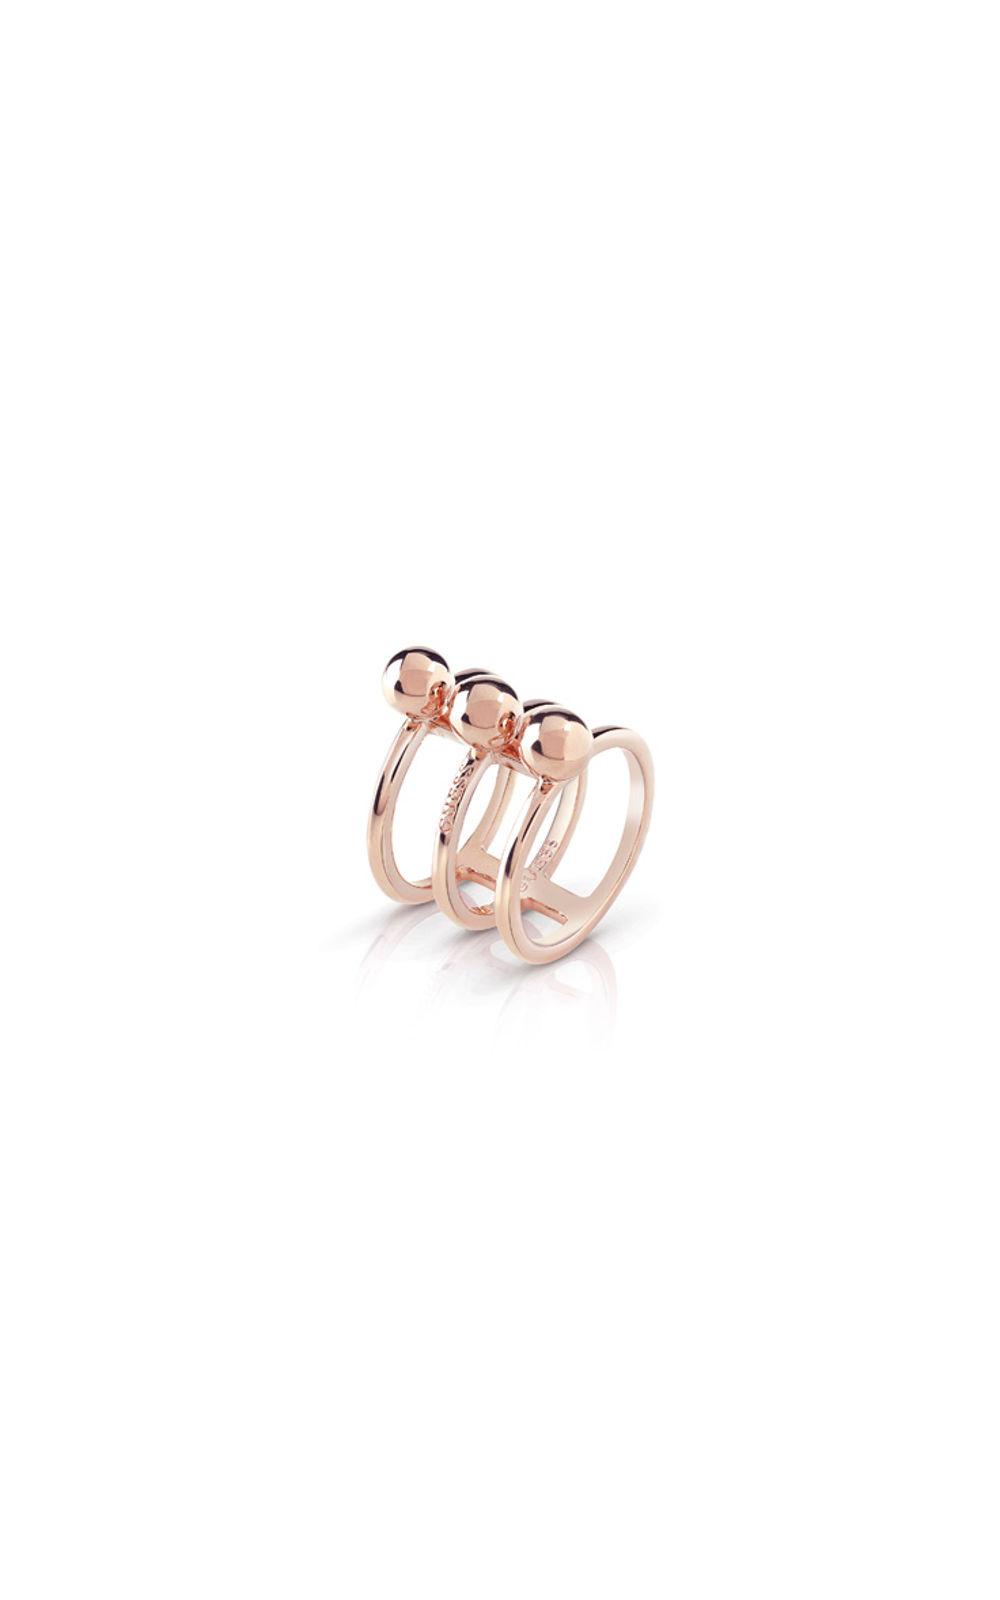 GUESS FAUX UBR85017-54 Ροζ Χρυσό Δαχτυλίδι Τρίβερο Με Χάντρες